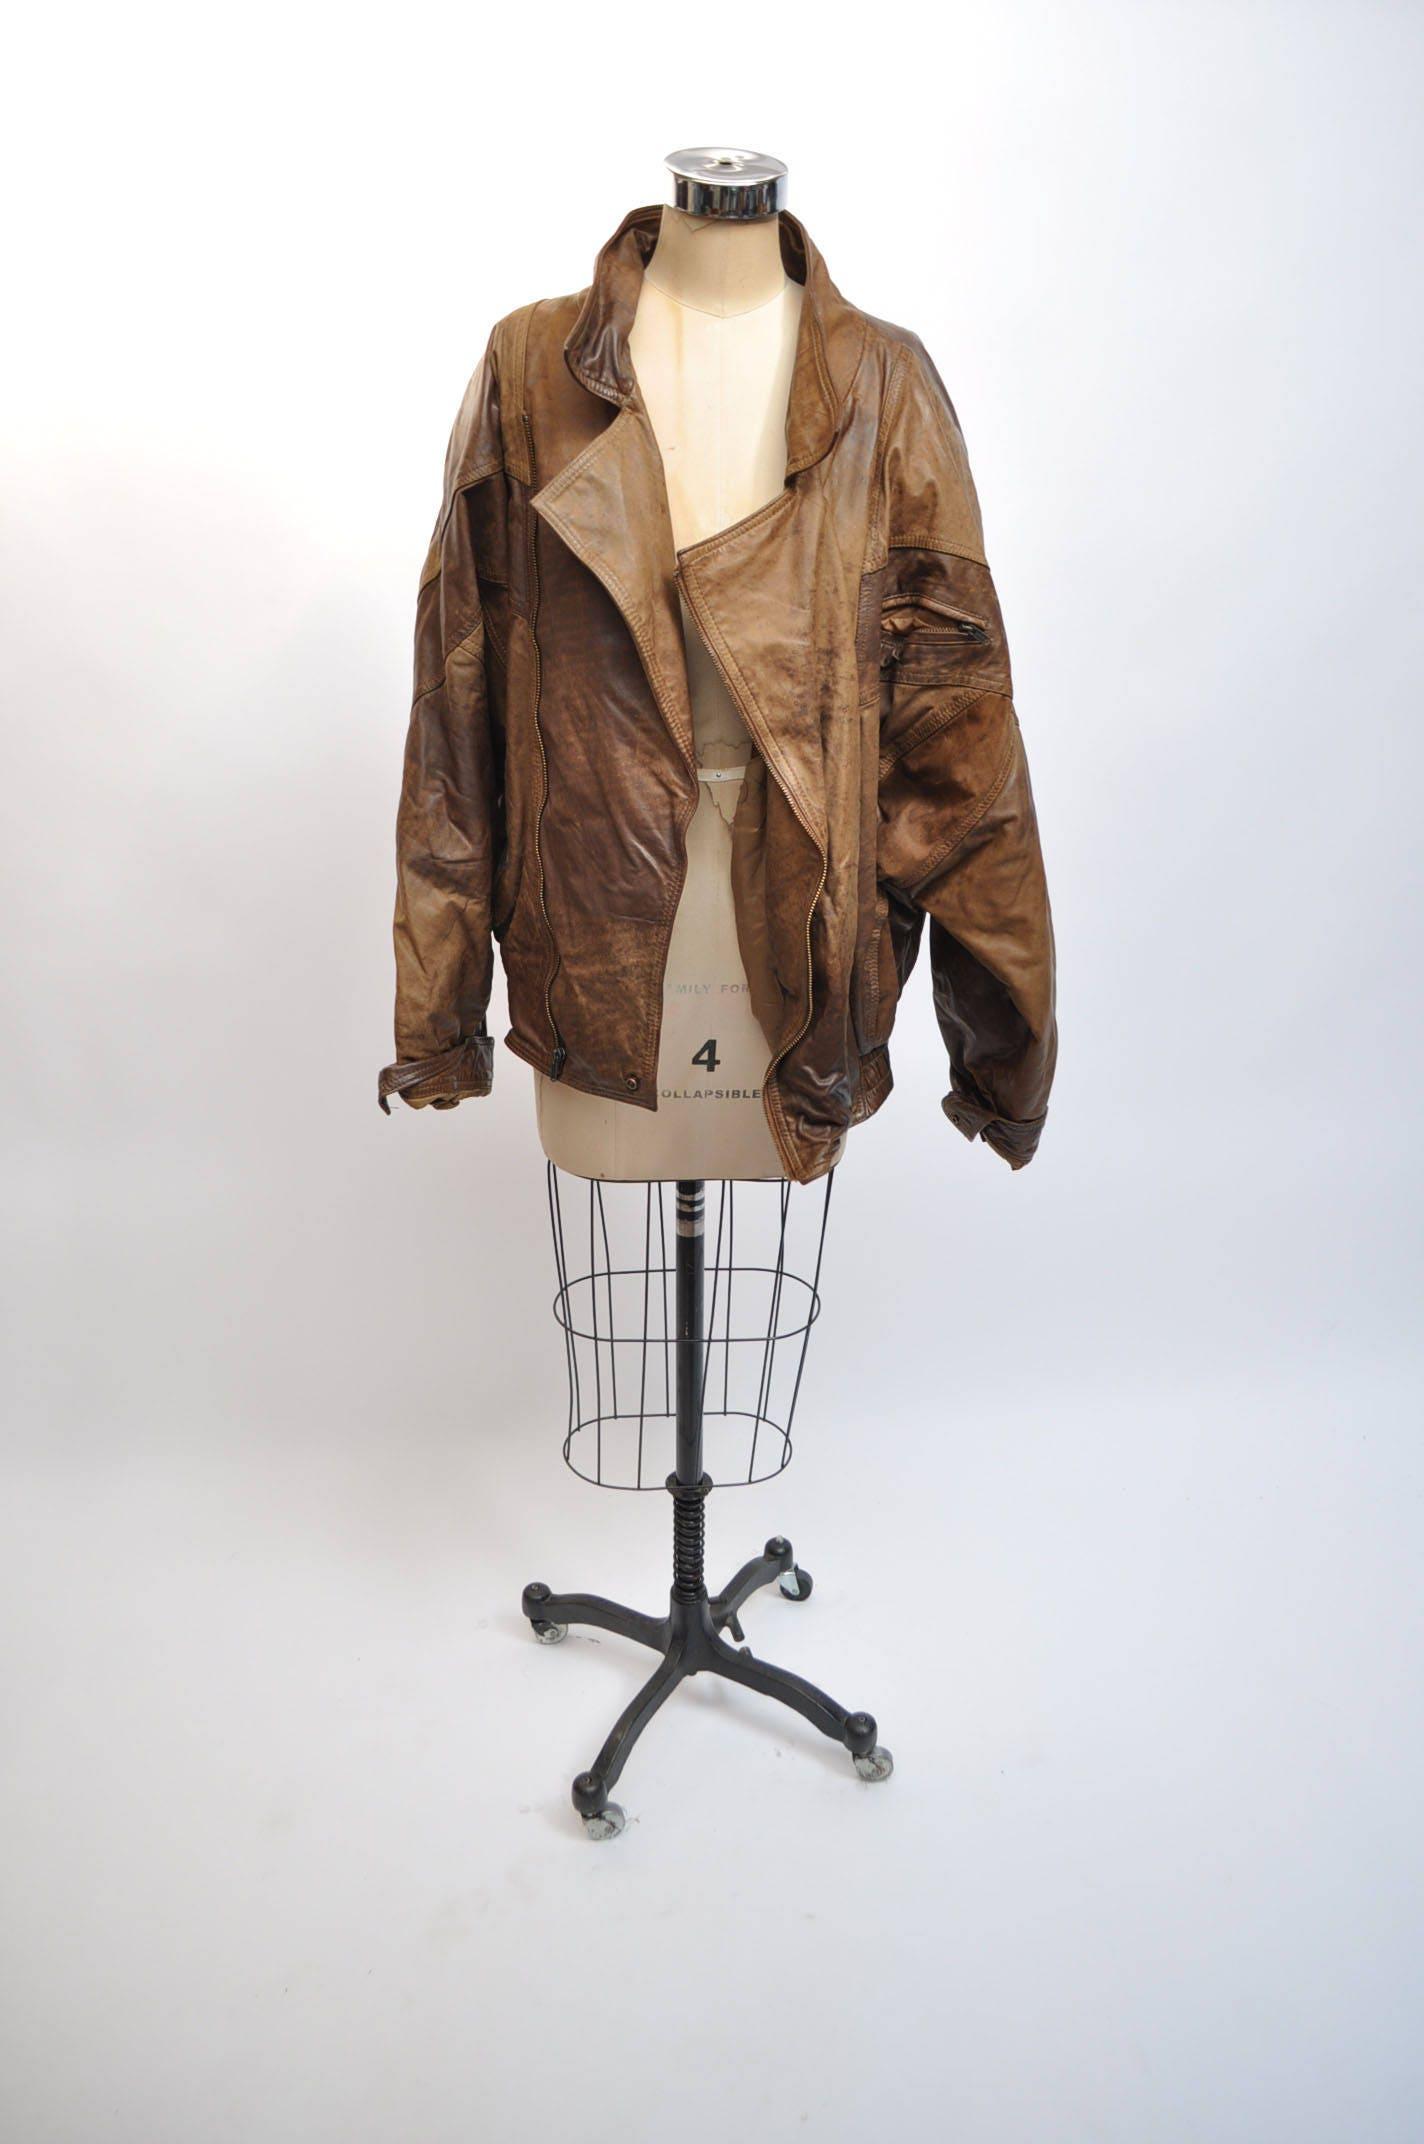 vintage leather jacket OVERSIZED bomber boyfriend dad 1980s avant garde slouch lWSO953a